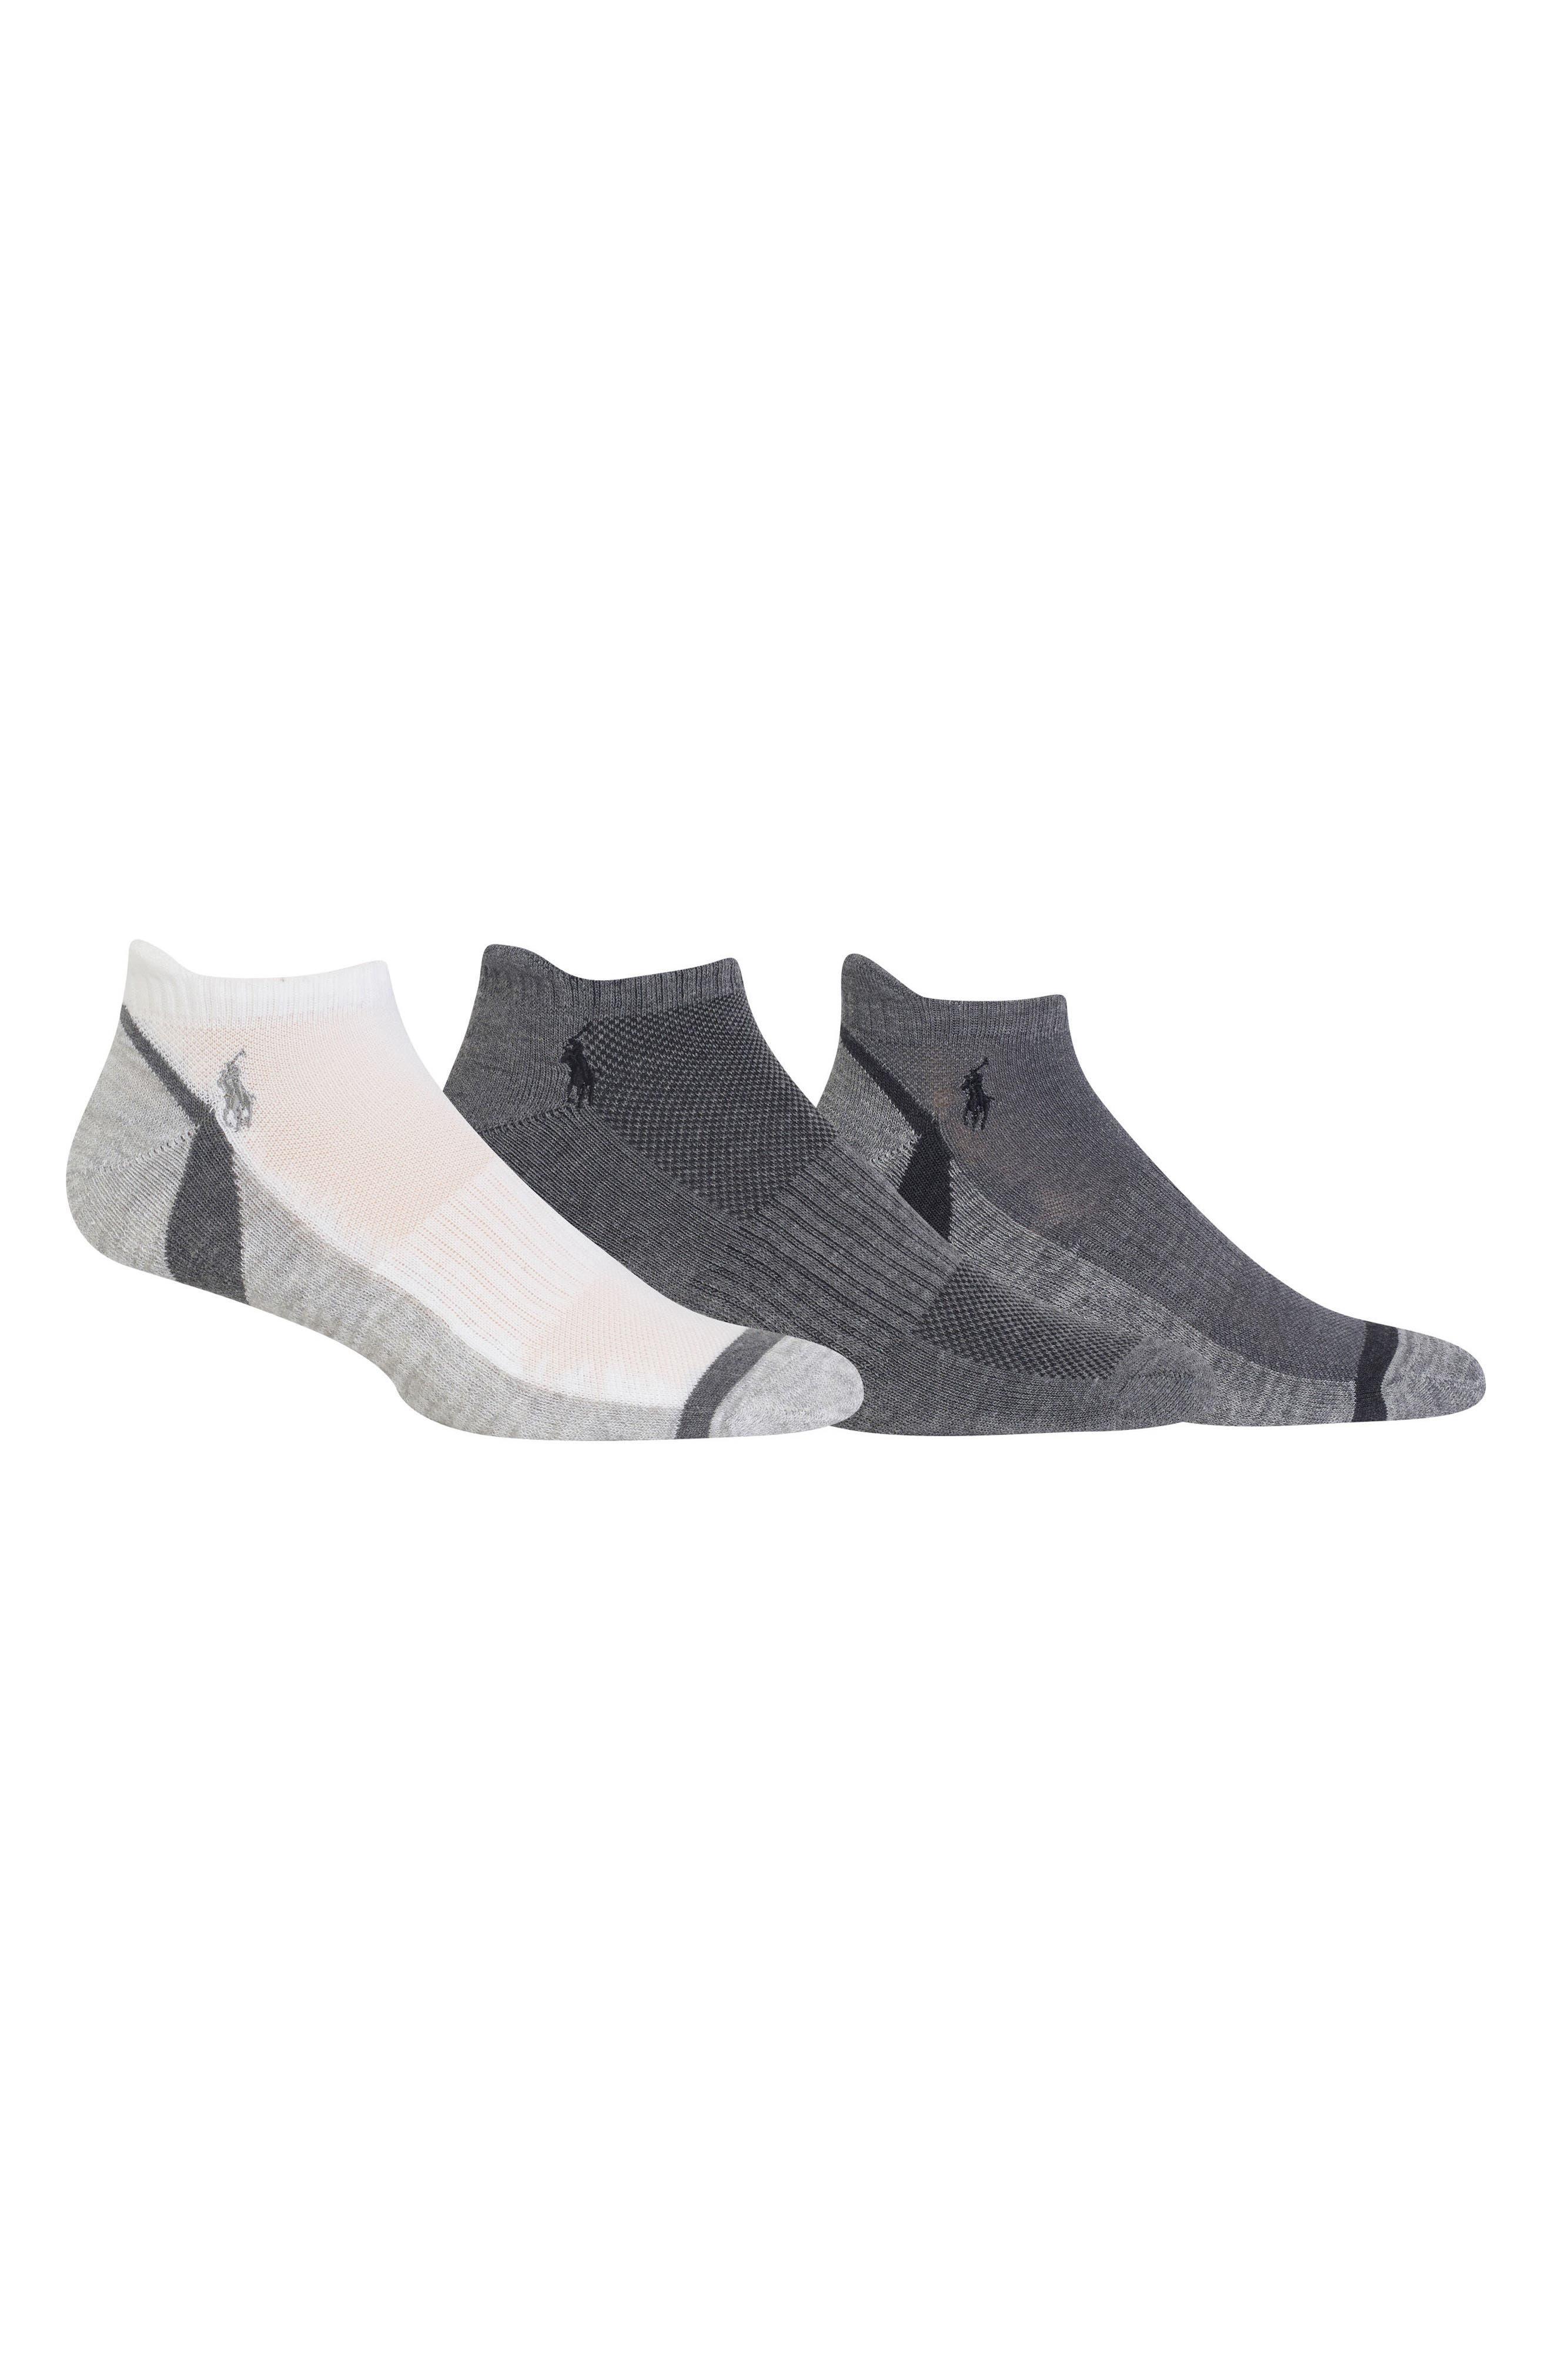 Polo Ralph Lauren 3-Pack Ankle Socks,                         Main,                         color, Grey Multi